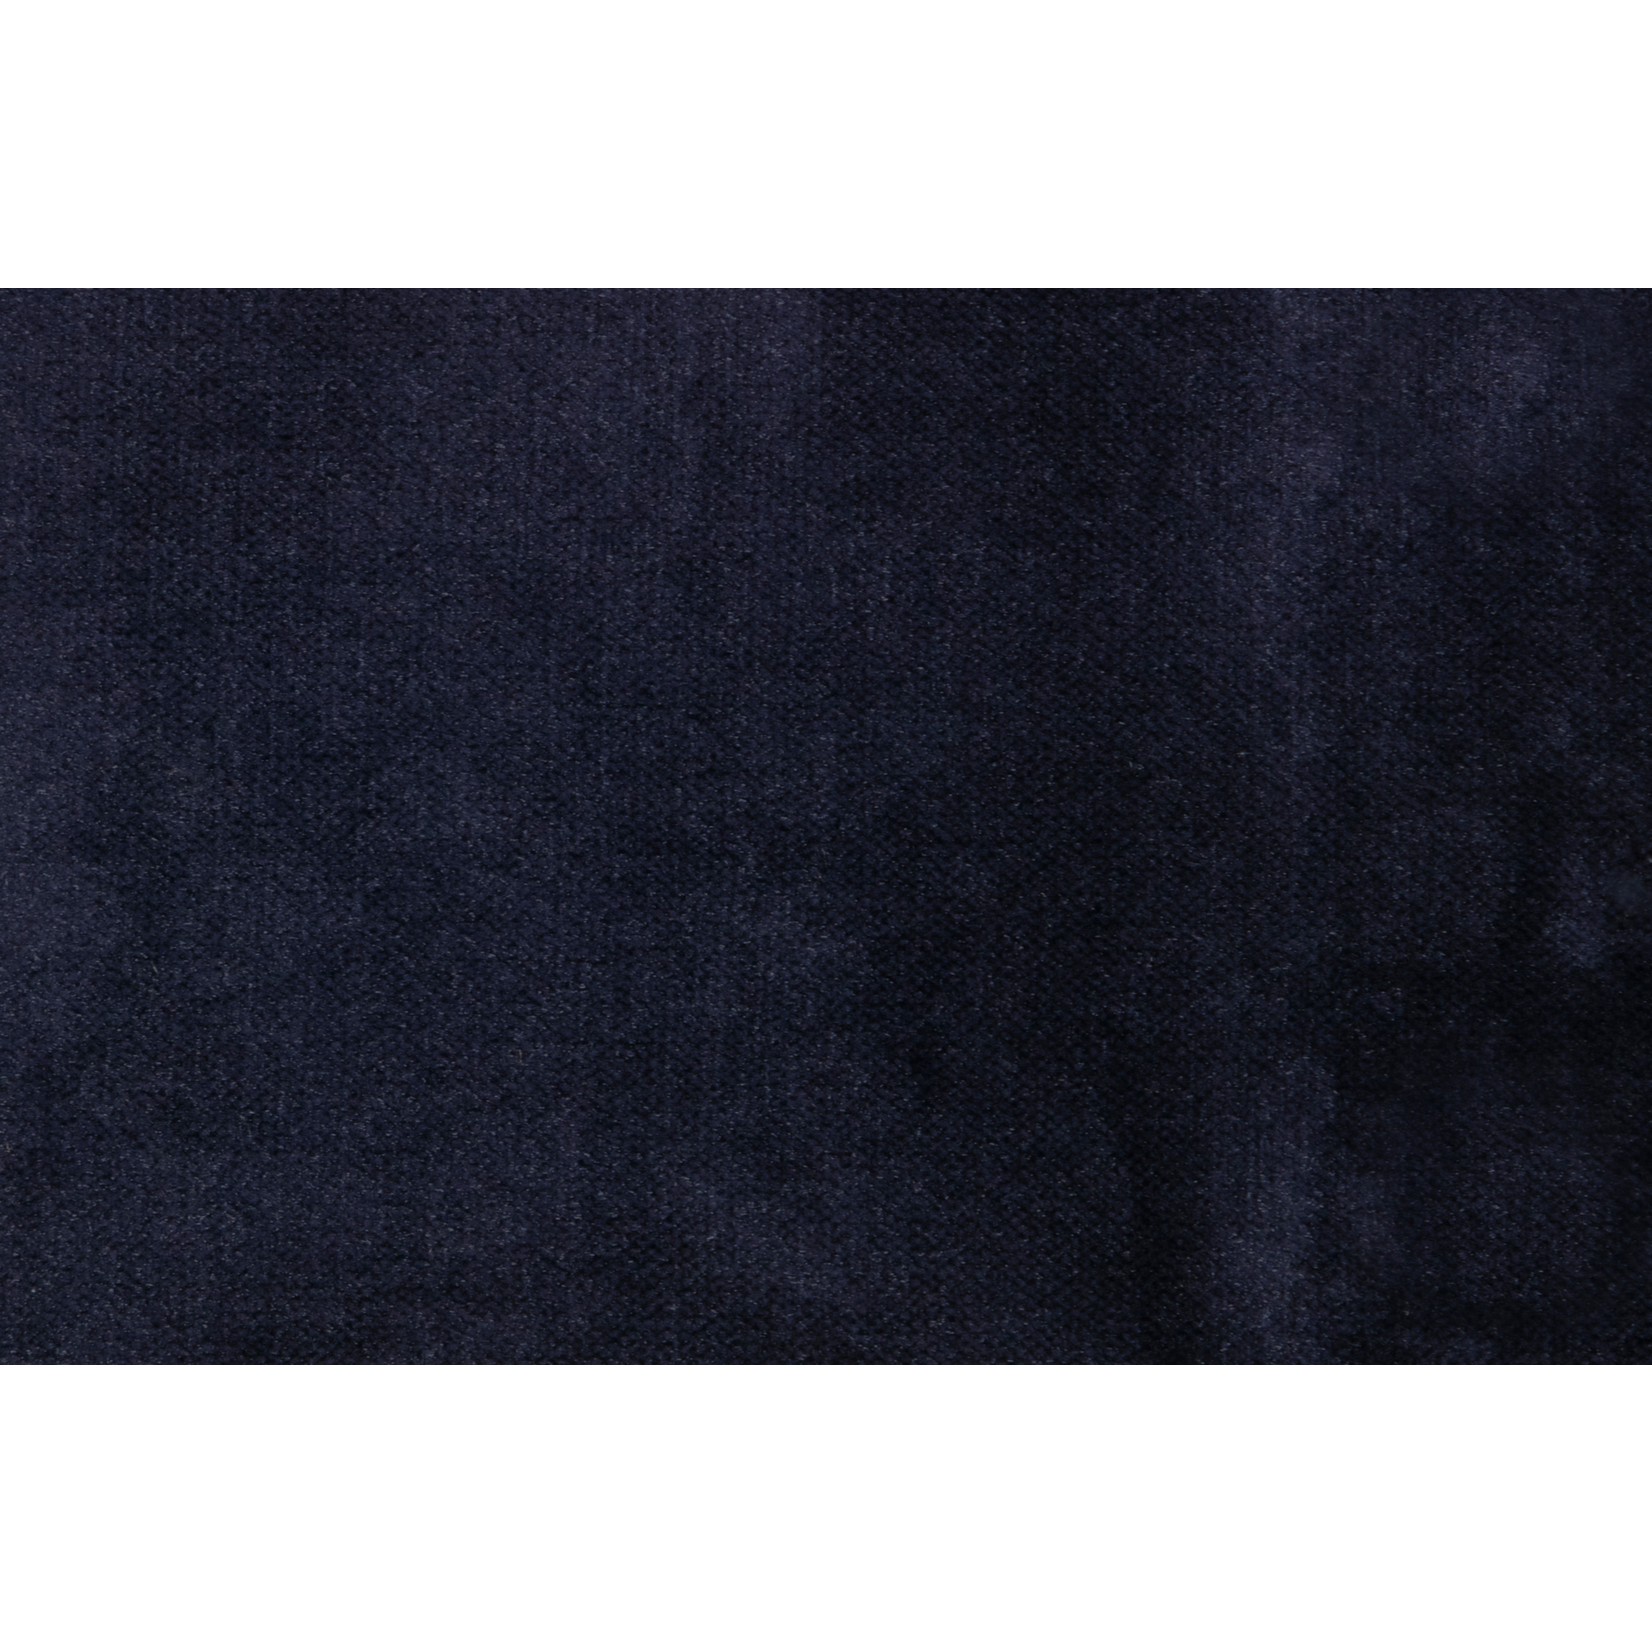 Be Pure Home Rodeo Classic Bank 3-zits Velvet Dark Blue Nightshade